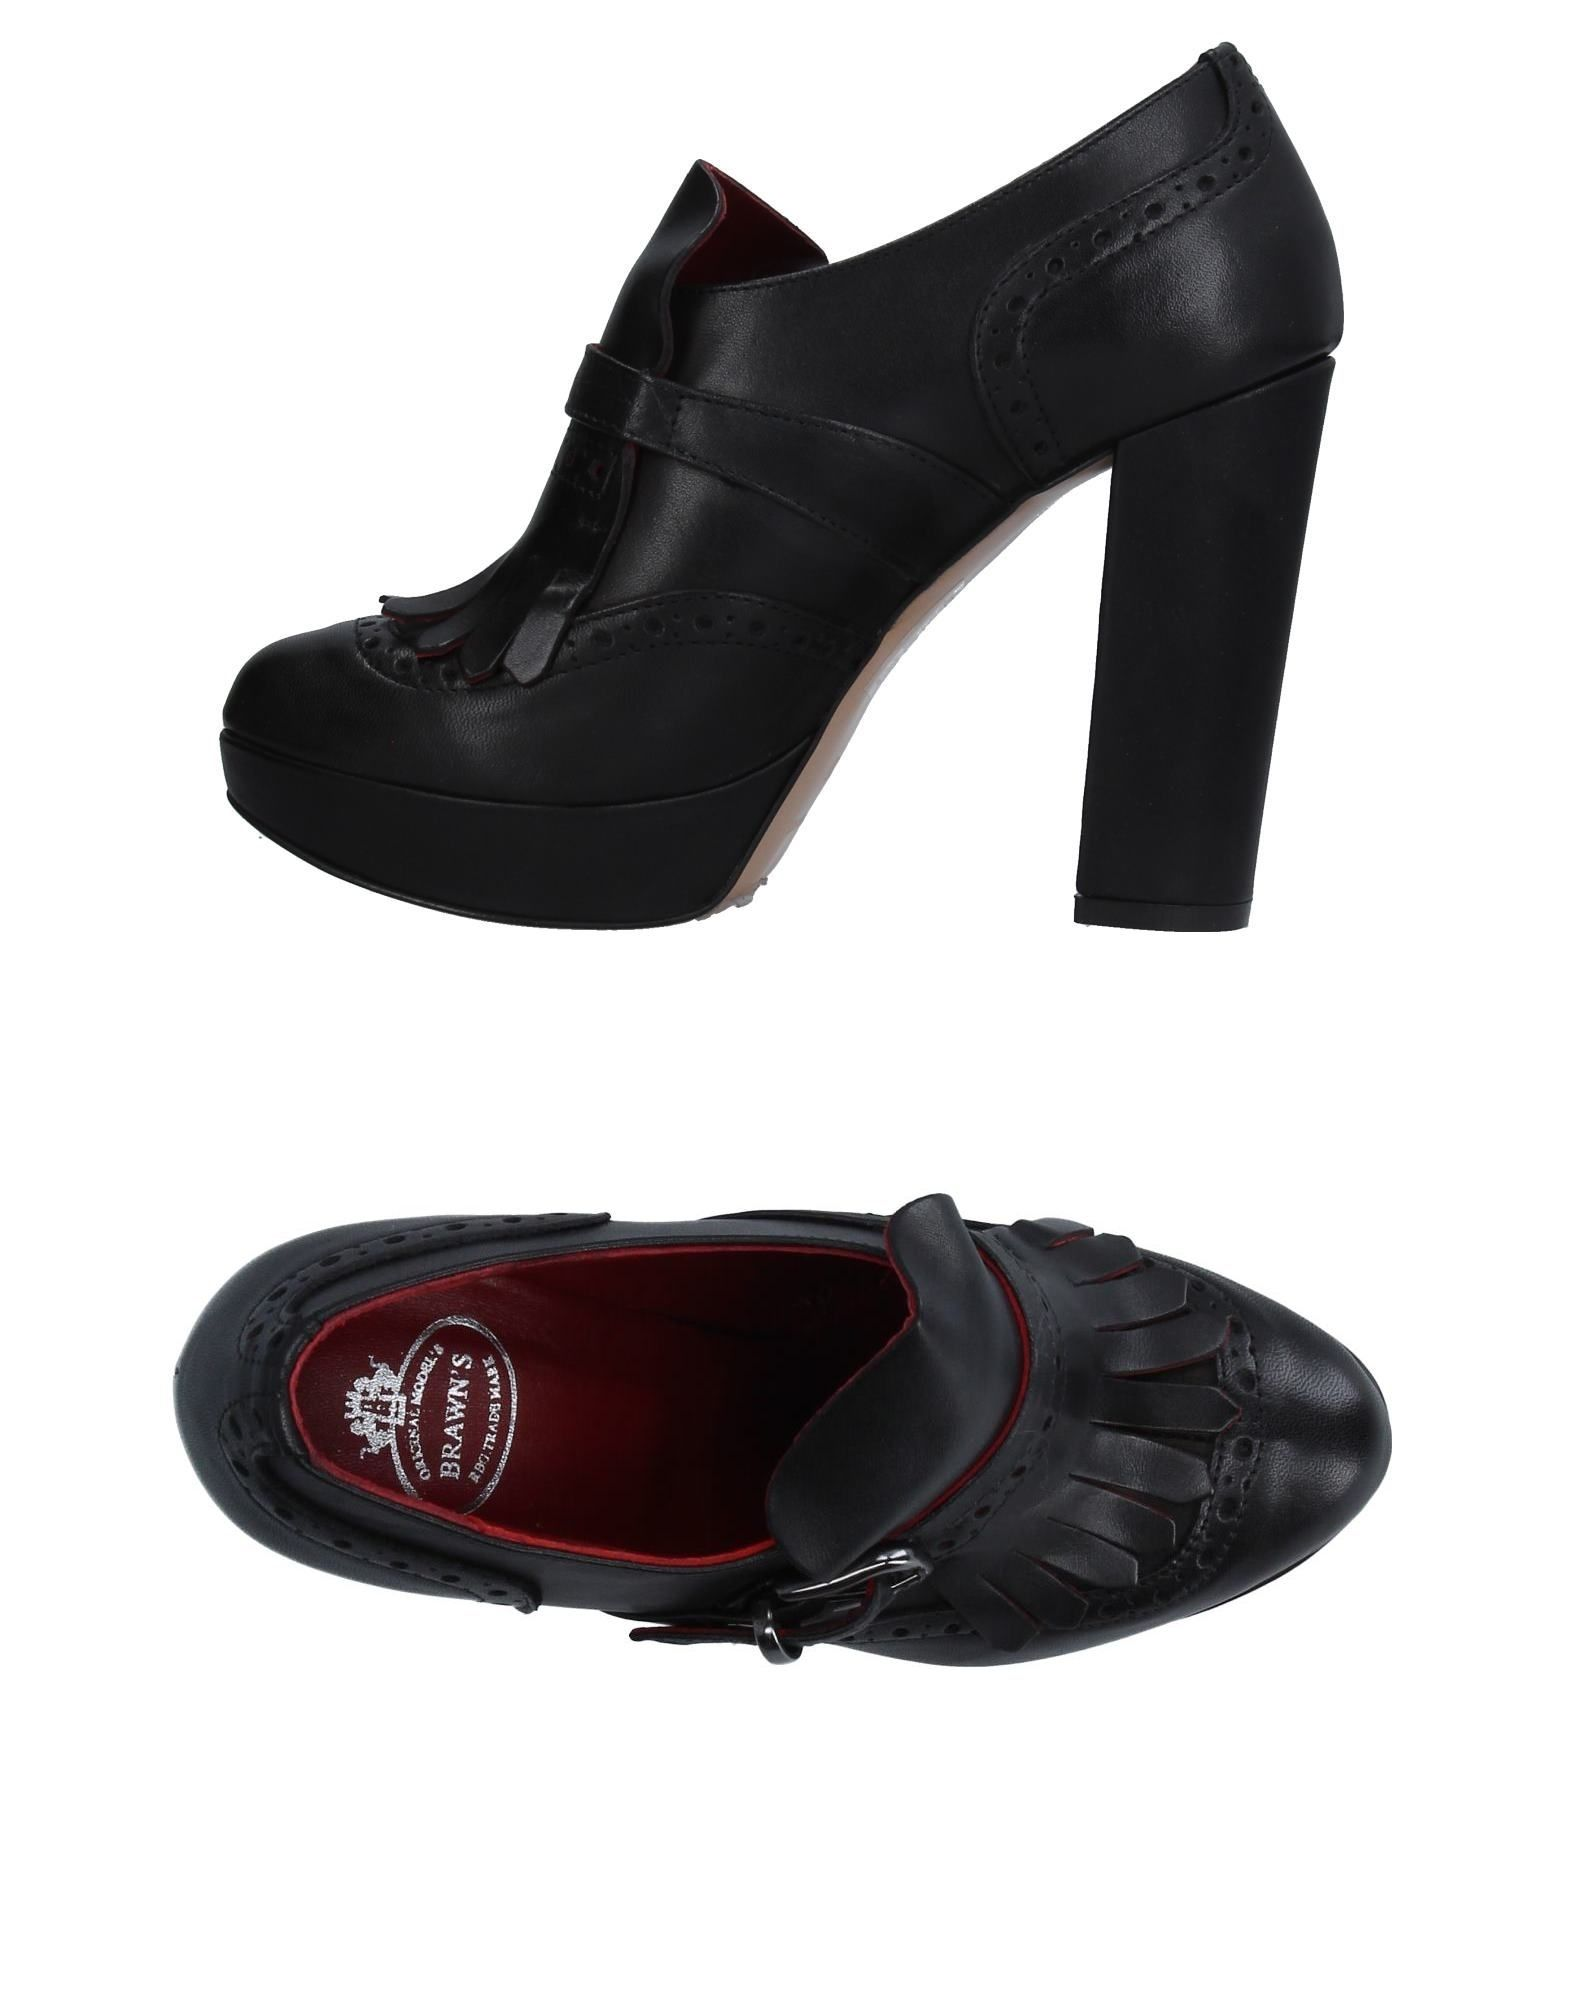 Brawn s Mokassins Damen 11265297TW Gute beliebte Qualität beliebte Gute Schuhe 8fdfb3